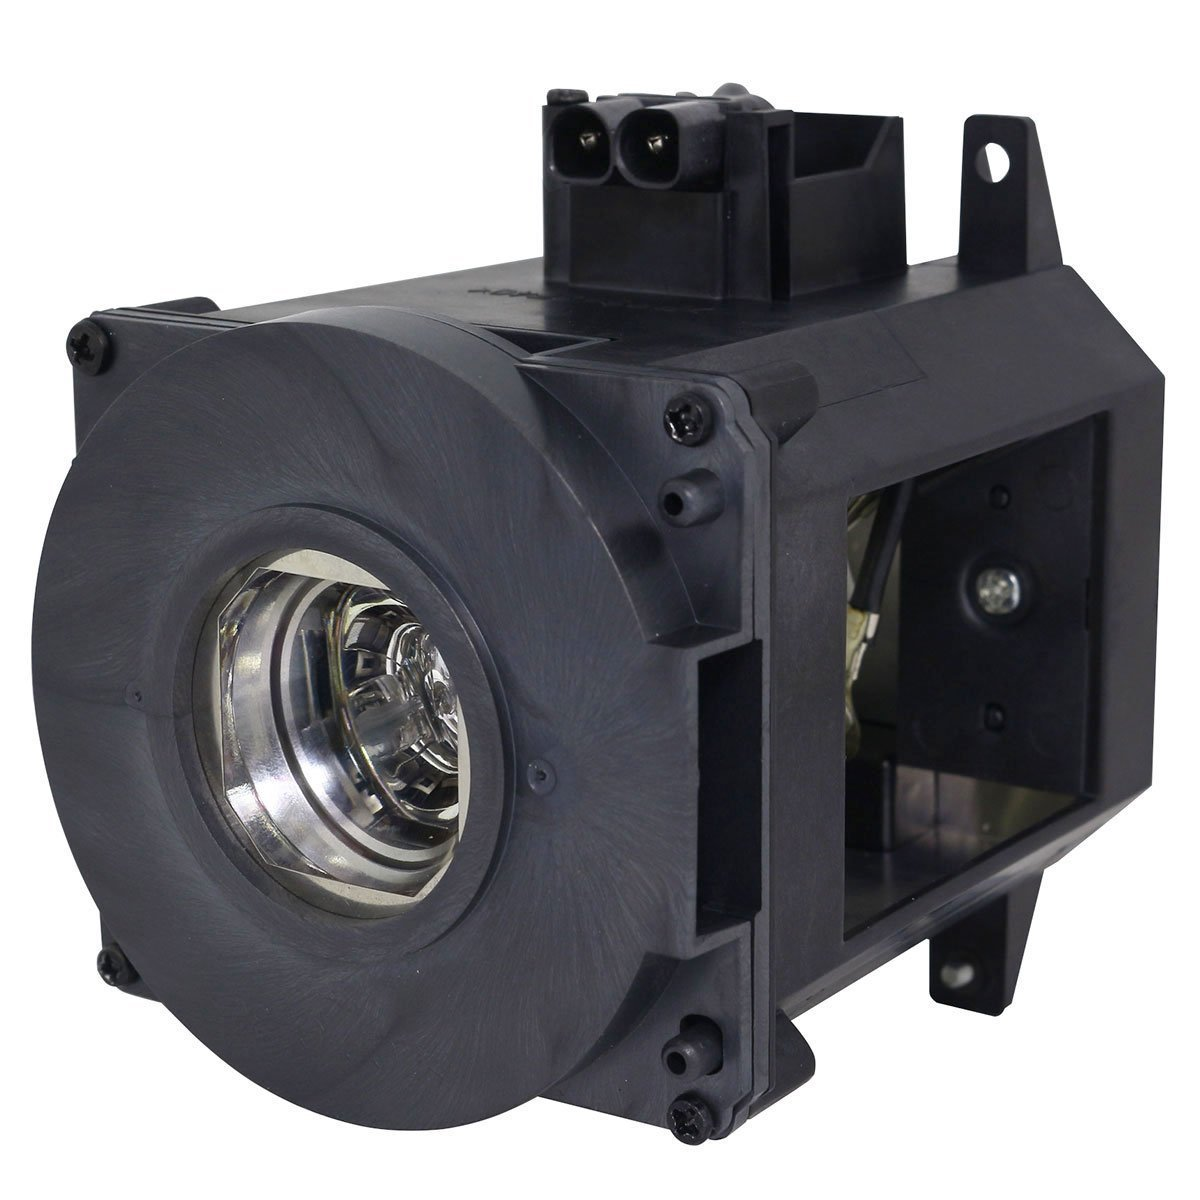 Lampara Proyector Nec Np-pa500u / Np-pa500x / Np-pa5520w...